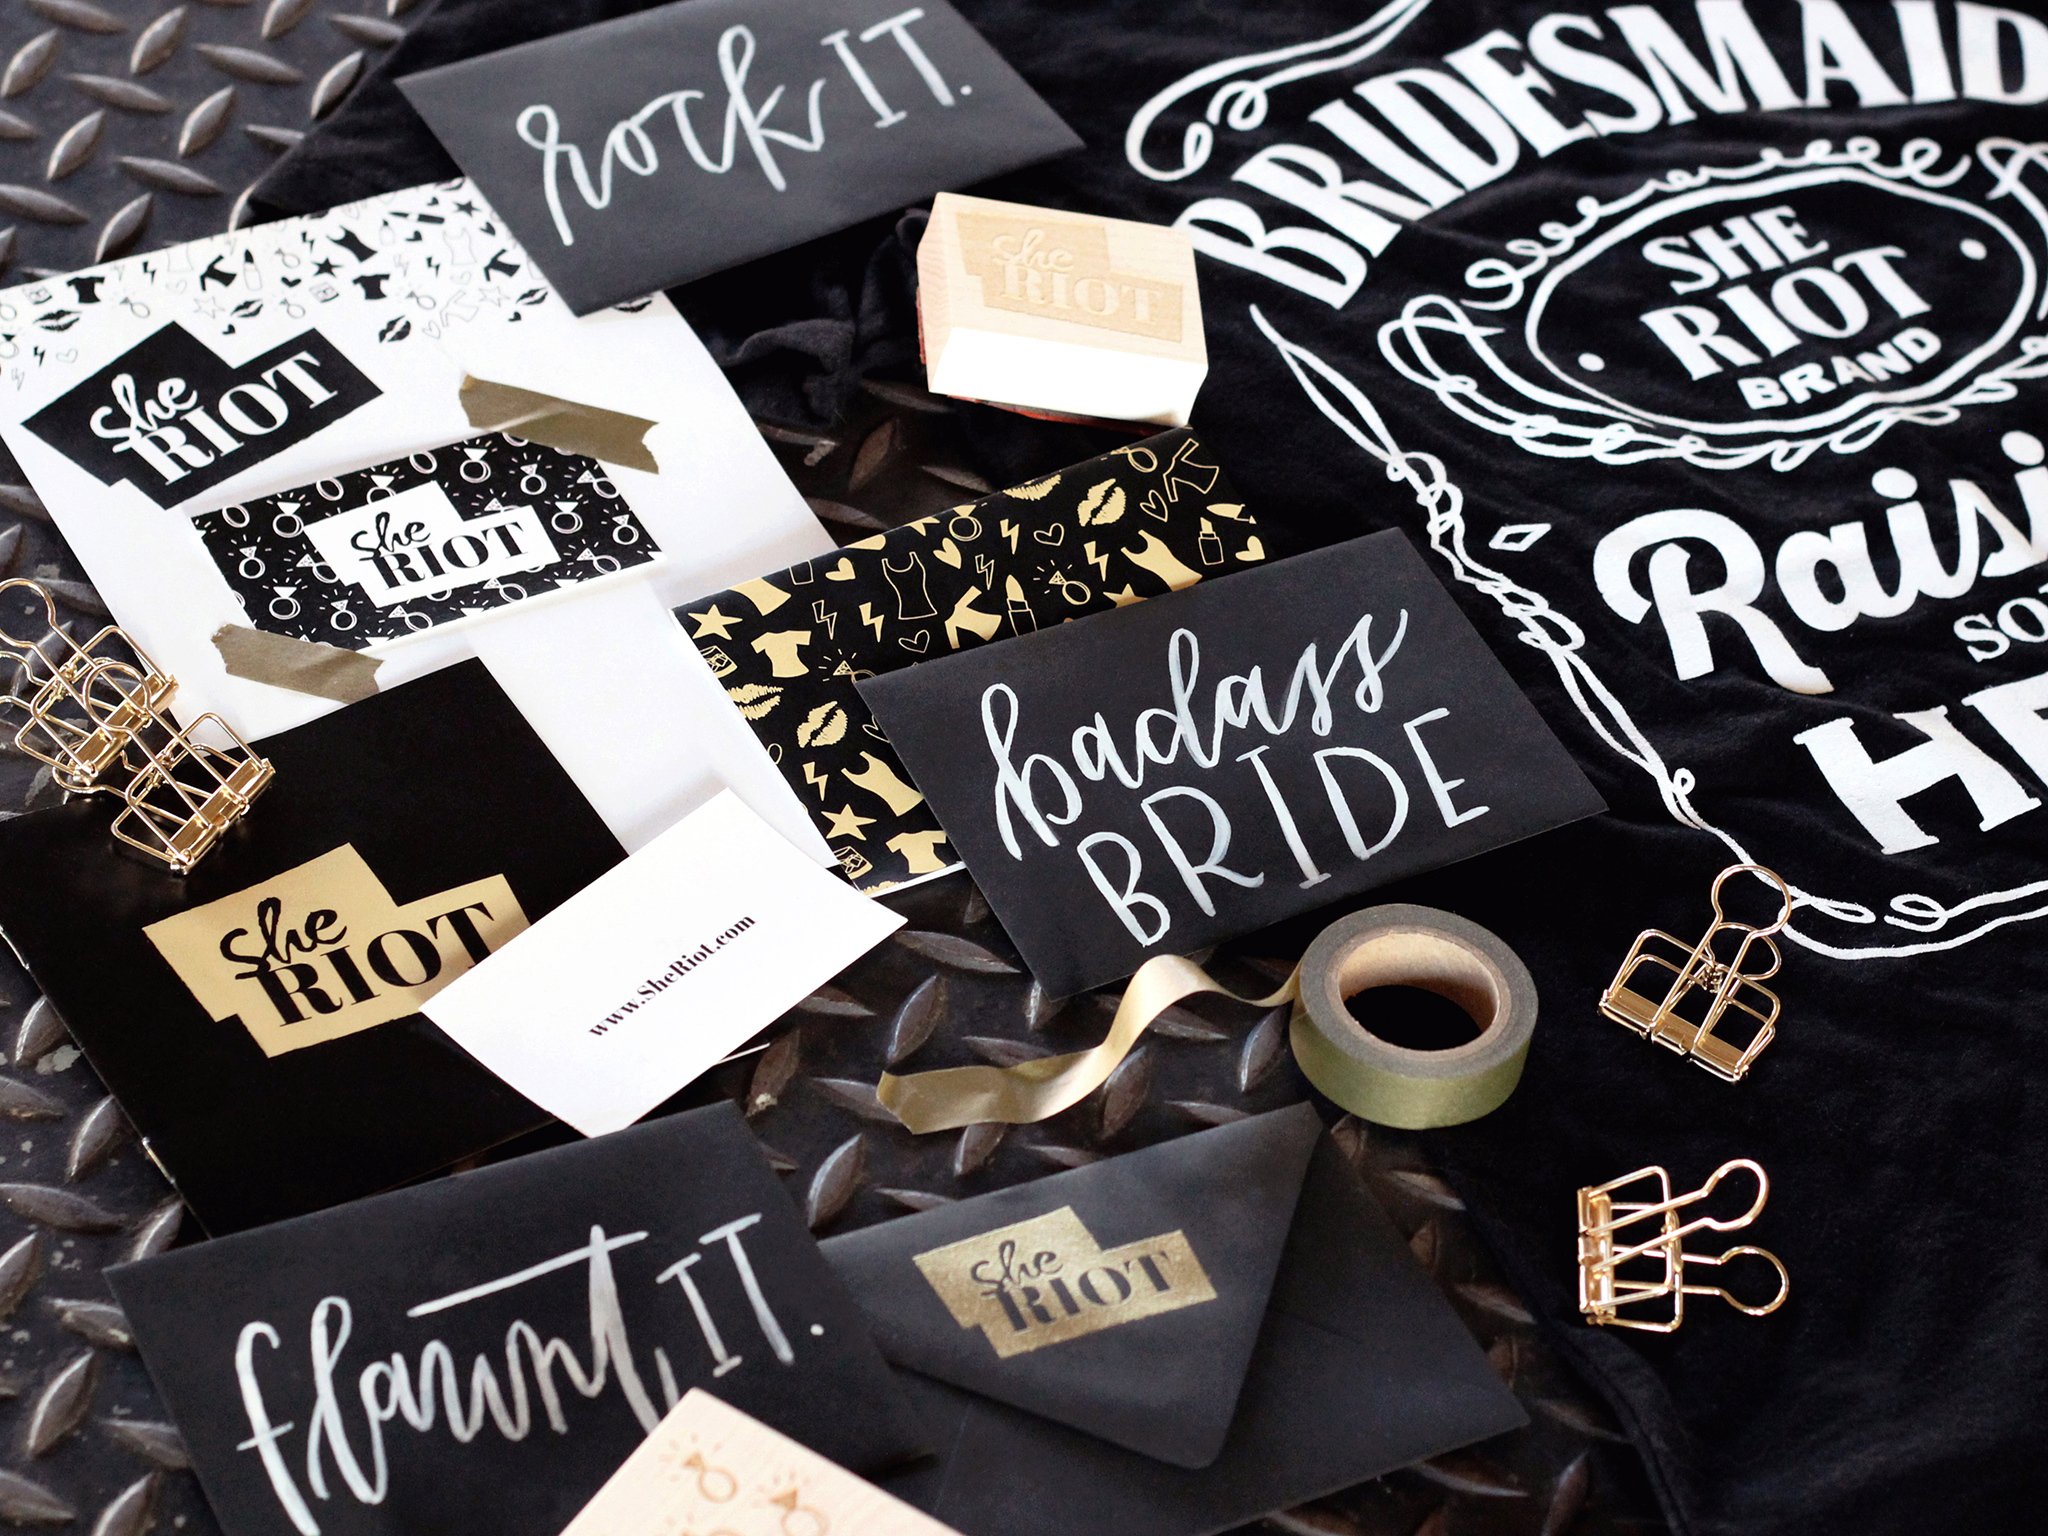 Heart-And-Dash-Branding-For-Wedding-Pros-Clothing-Line.JPG